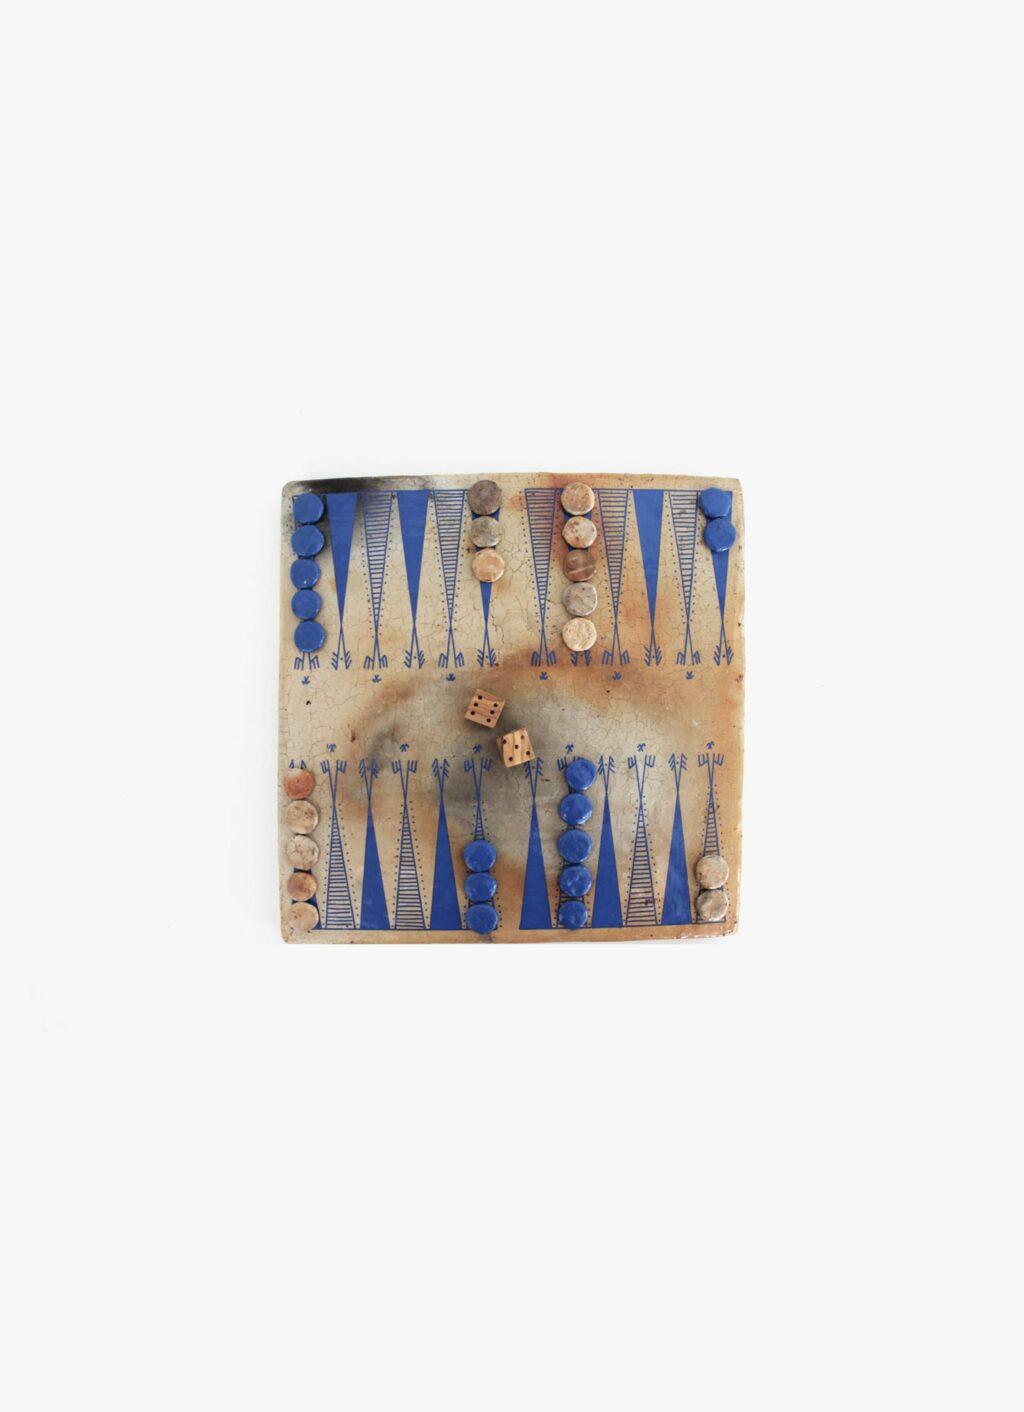 Flayou - Chich-Bich - Backgammon - Special Edition - Neon blue